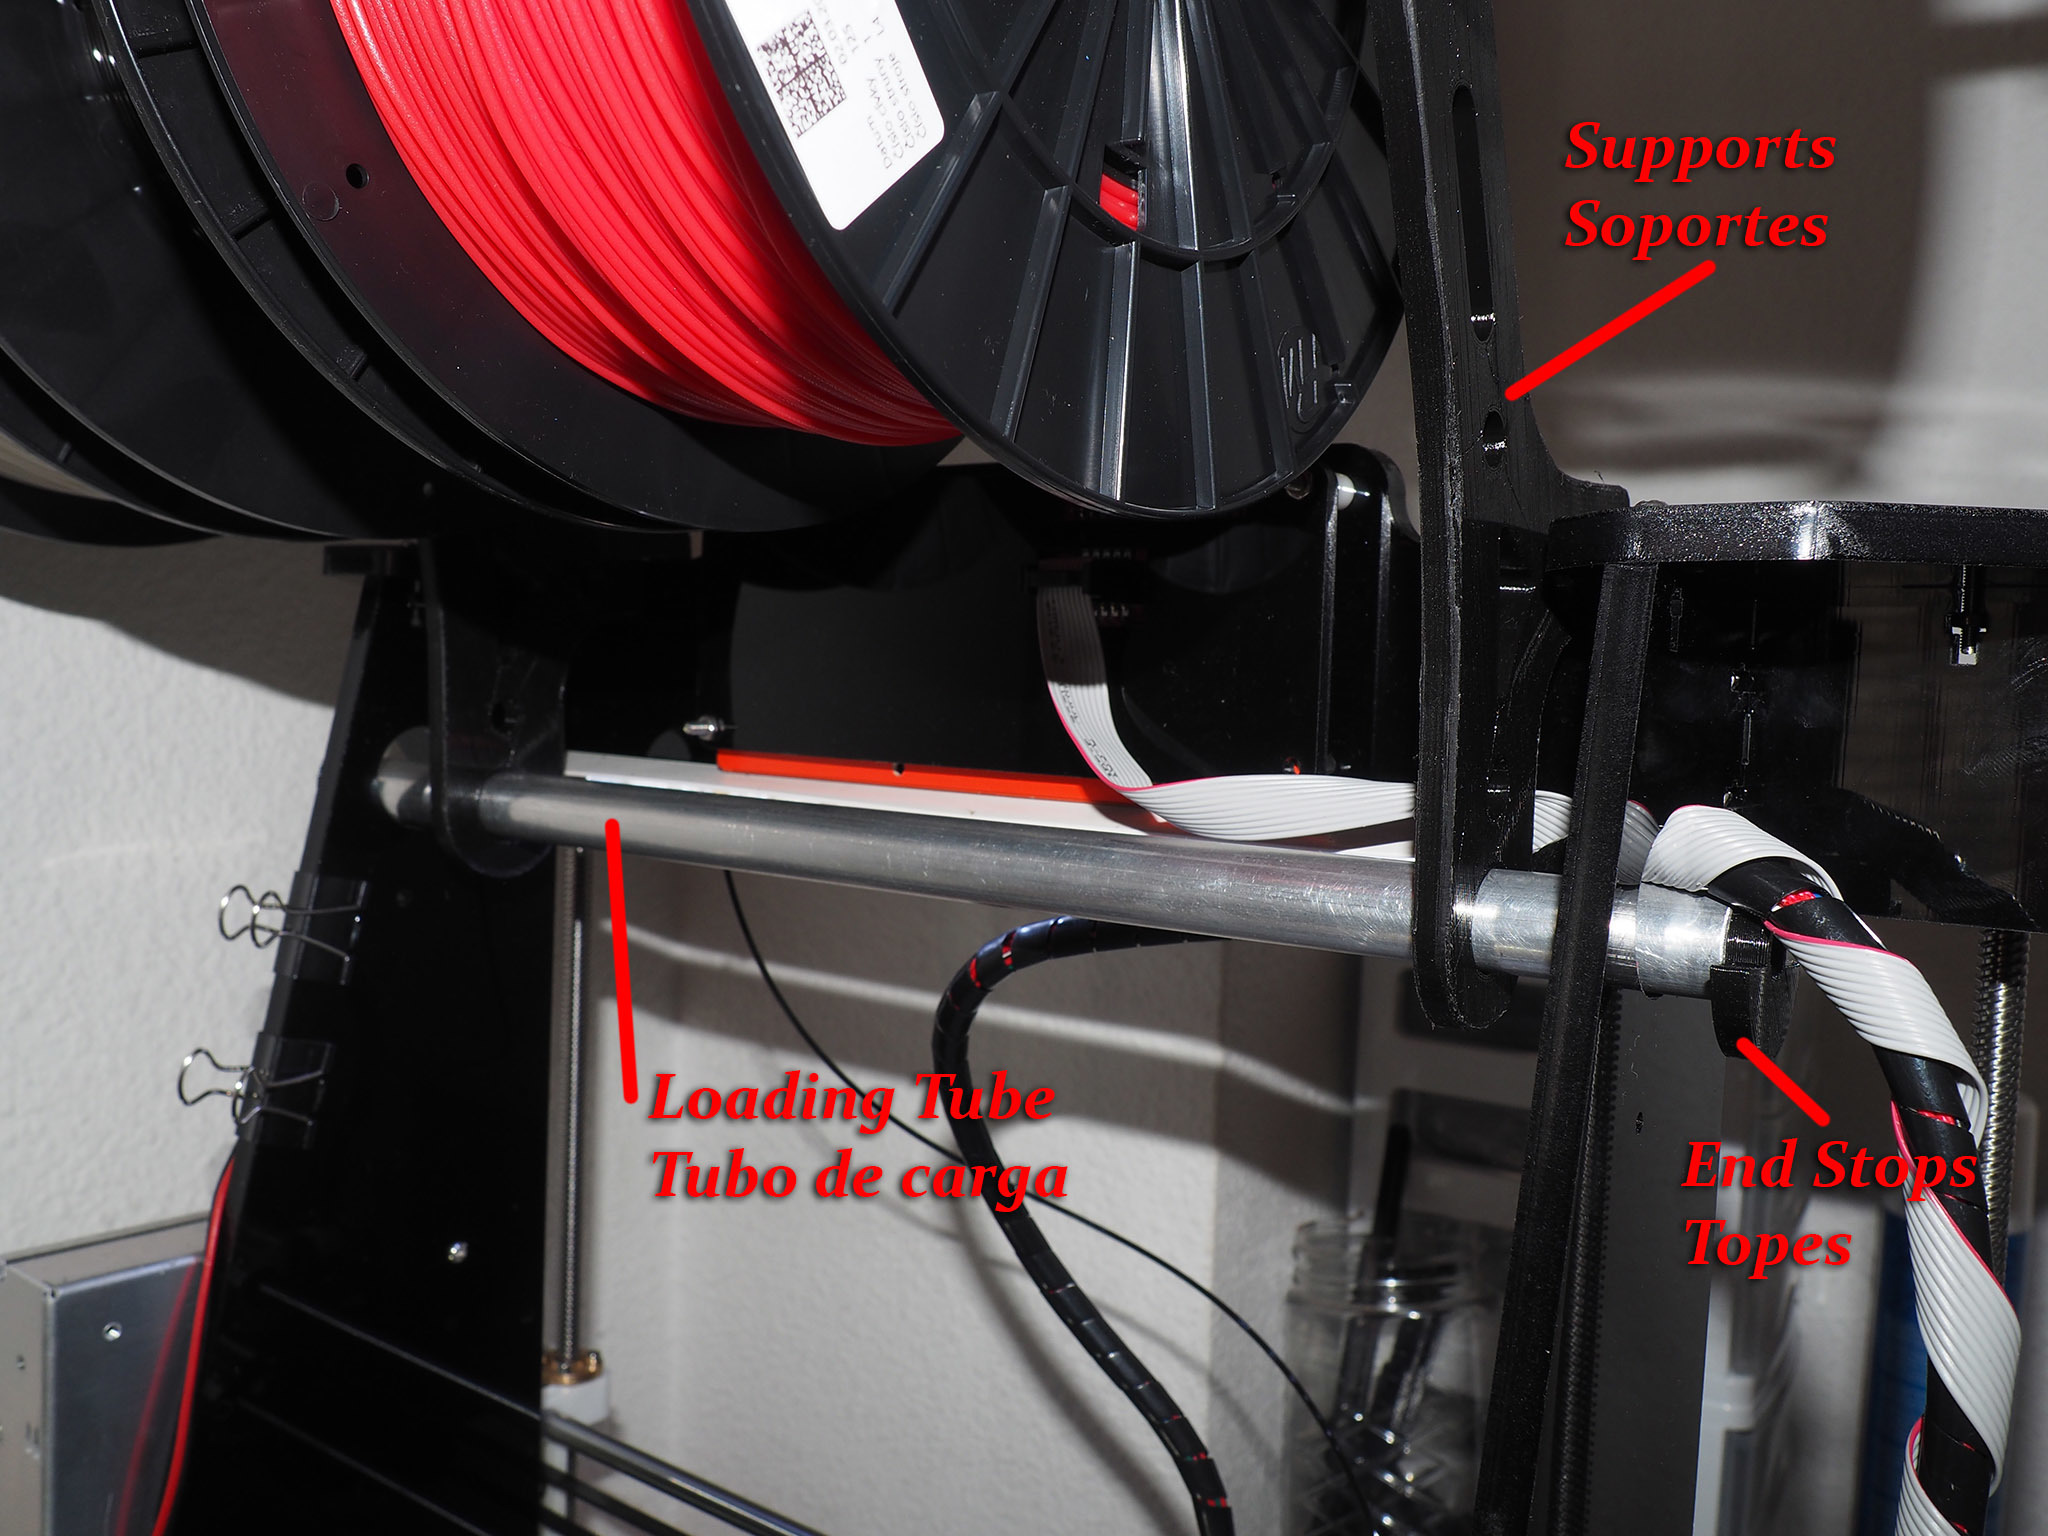 AMF00315_copia.jpg Download free STL file Strong 4 Spool Holder • 3D printer object, dancingchicken